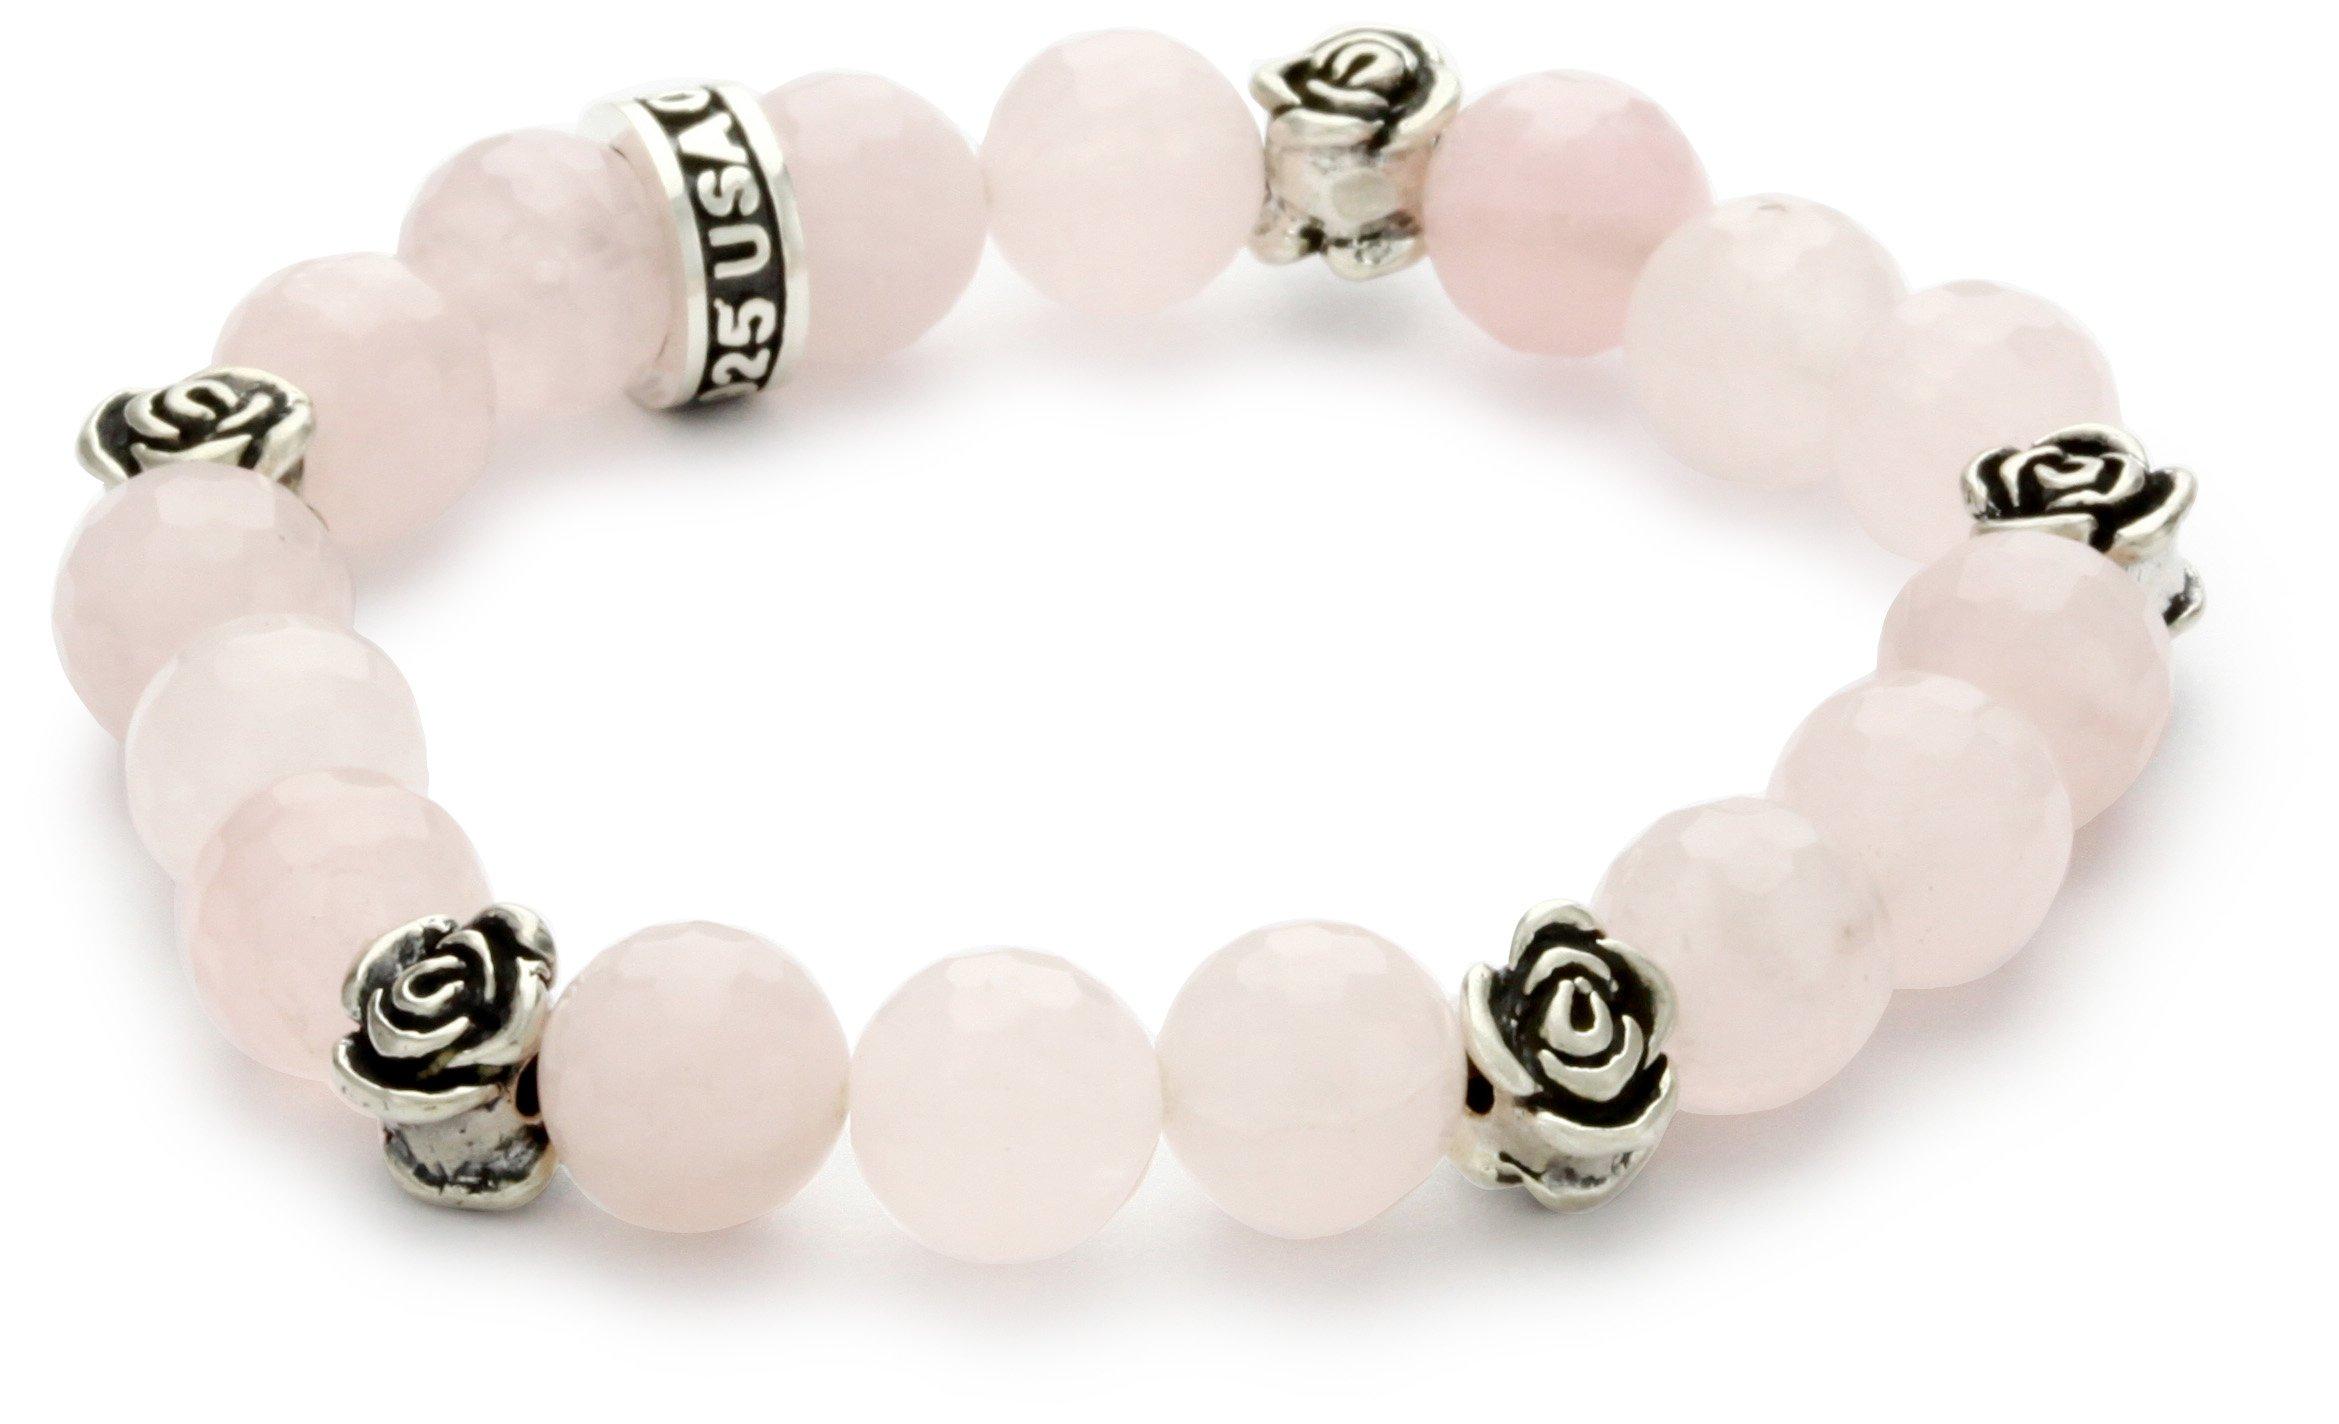 King Baby 10mm Rose Quartz Bead Bracelet with Roses